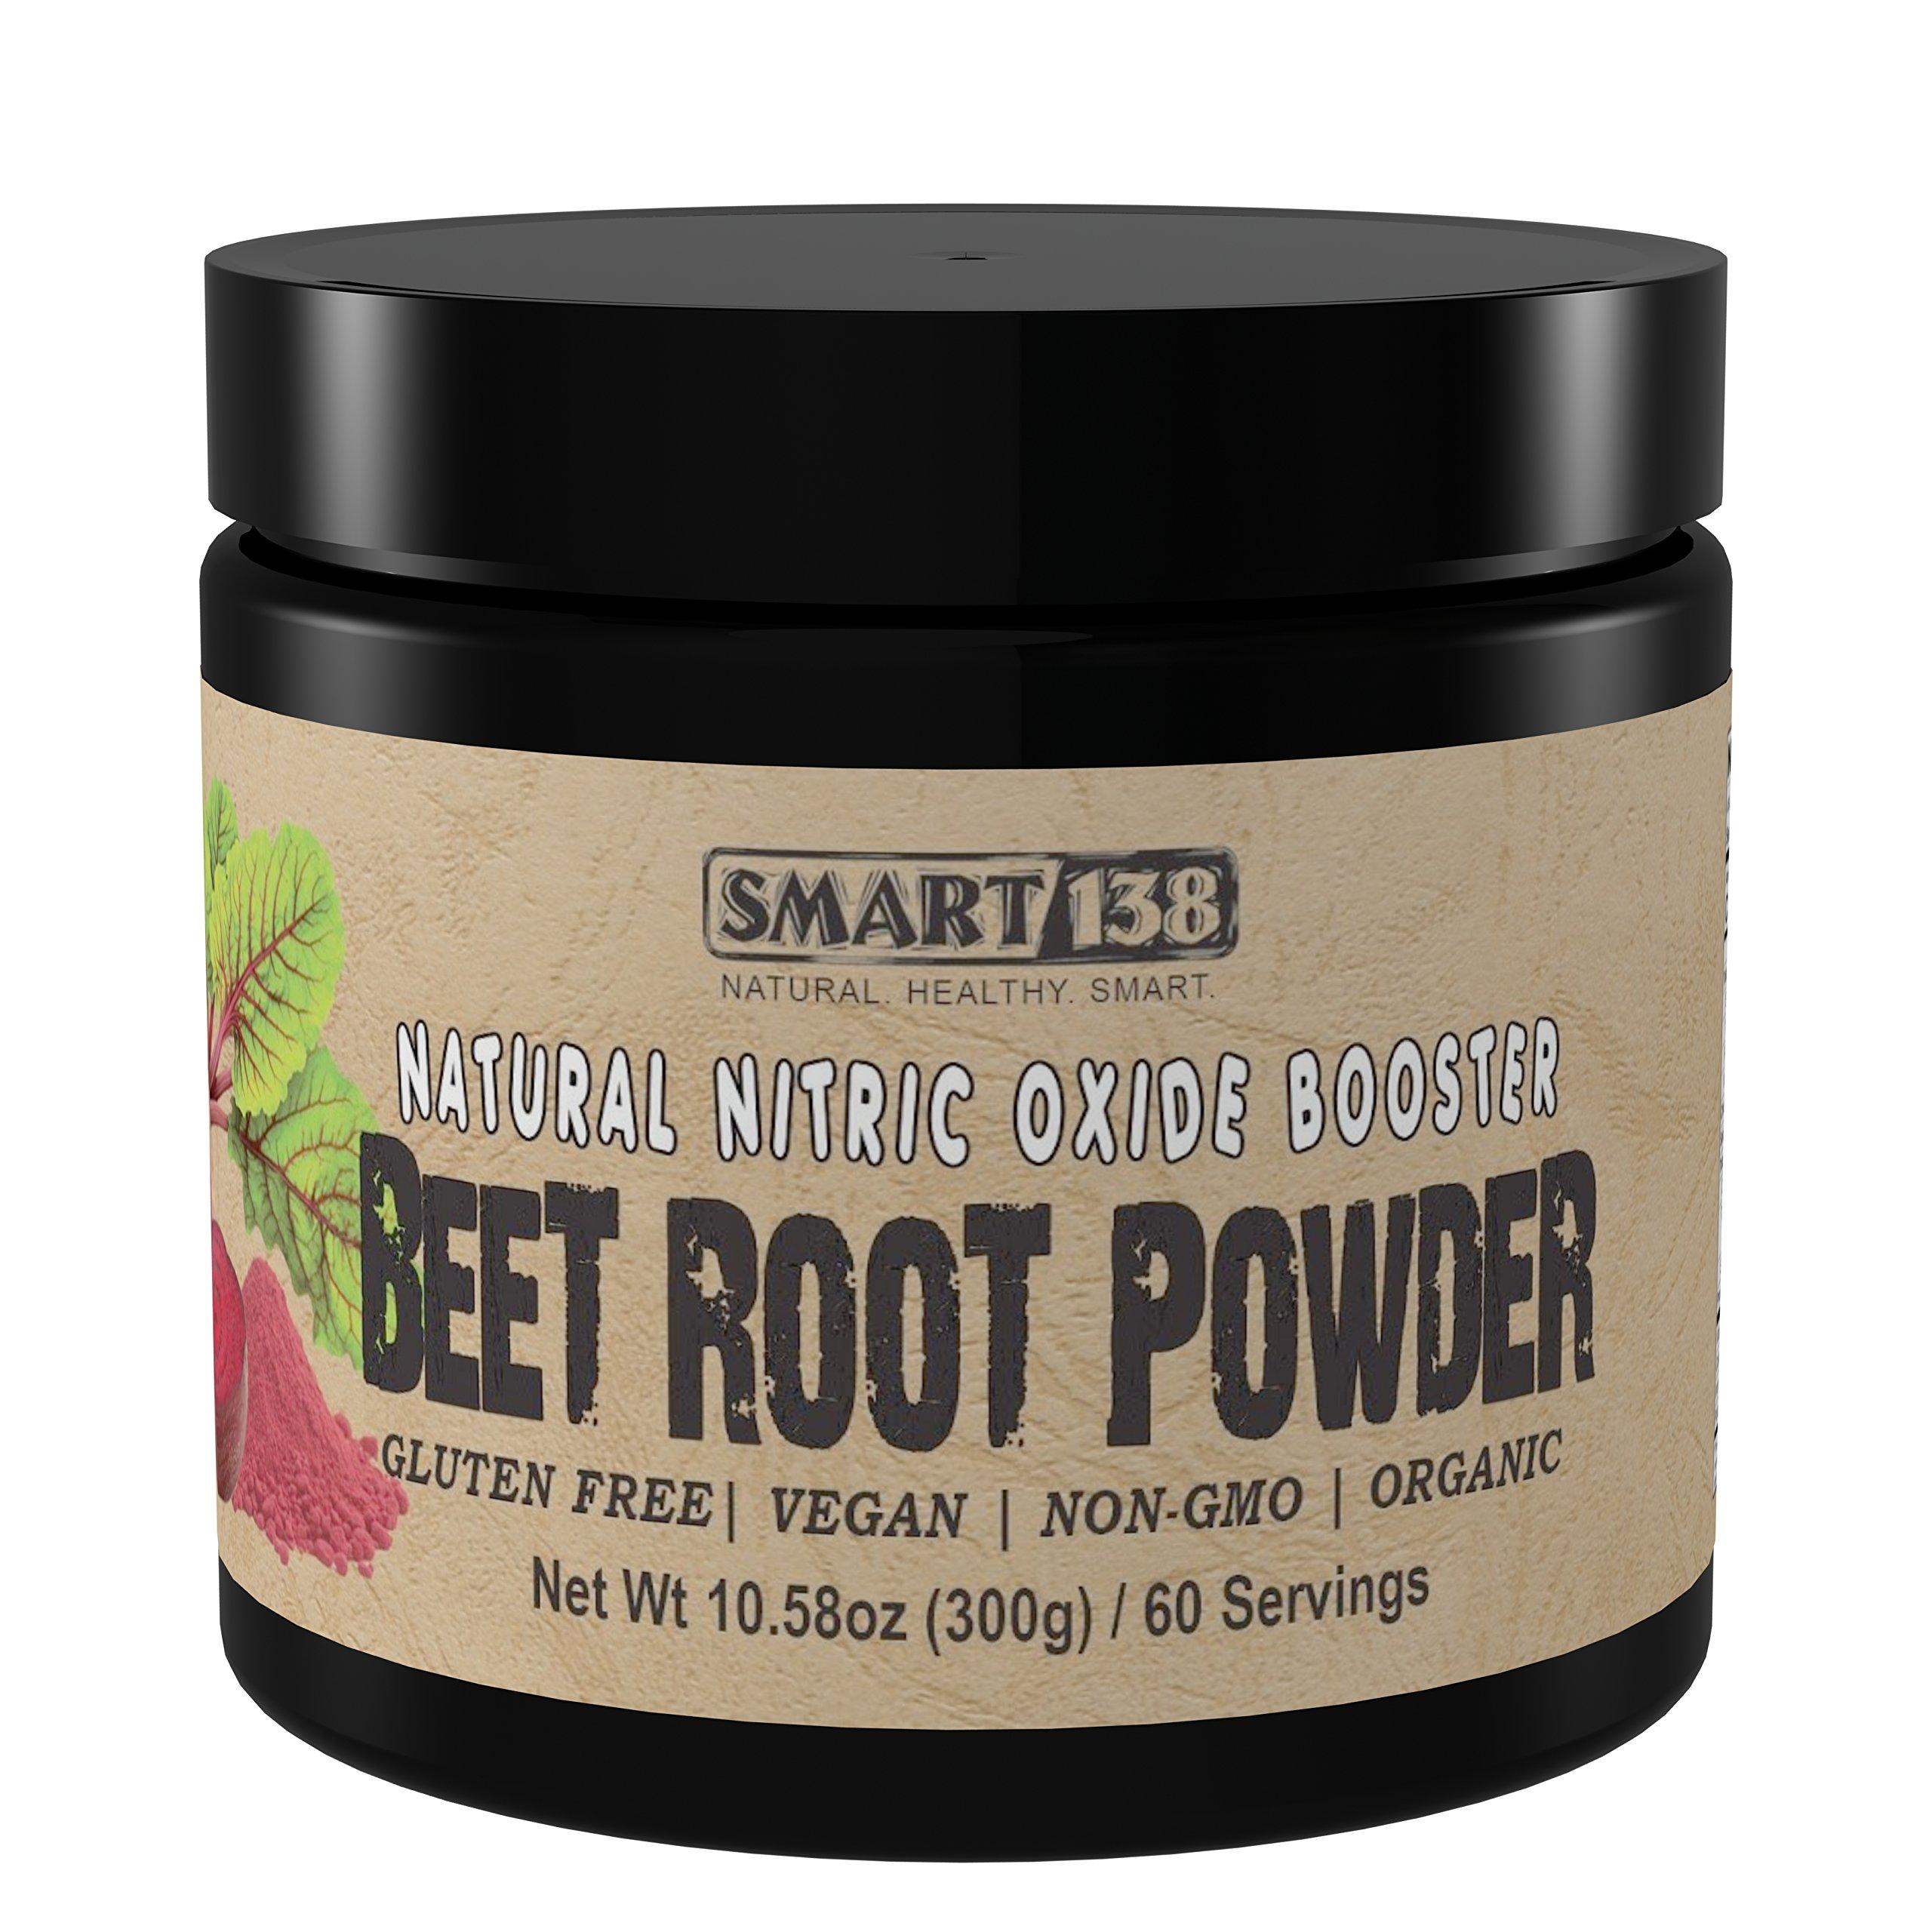 100% Organic Beet Root Powder (300g / 10.58oz) Premium Natural Nitric Oxide Booster